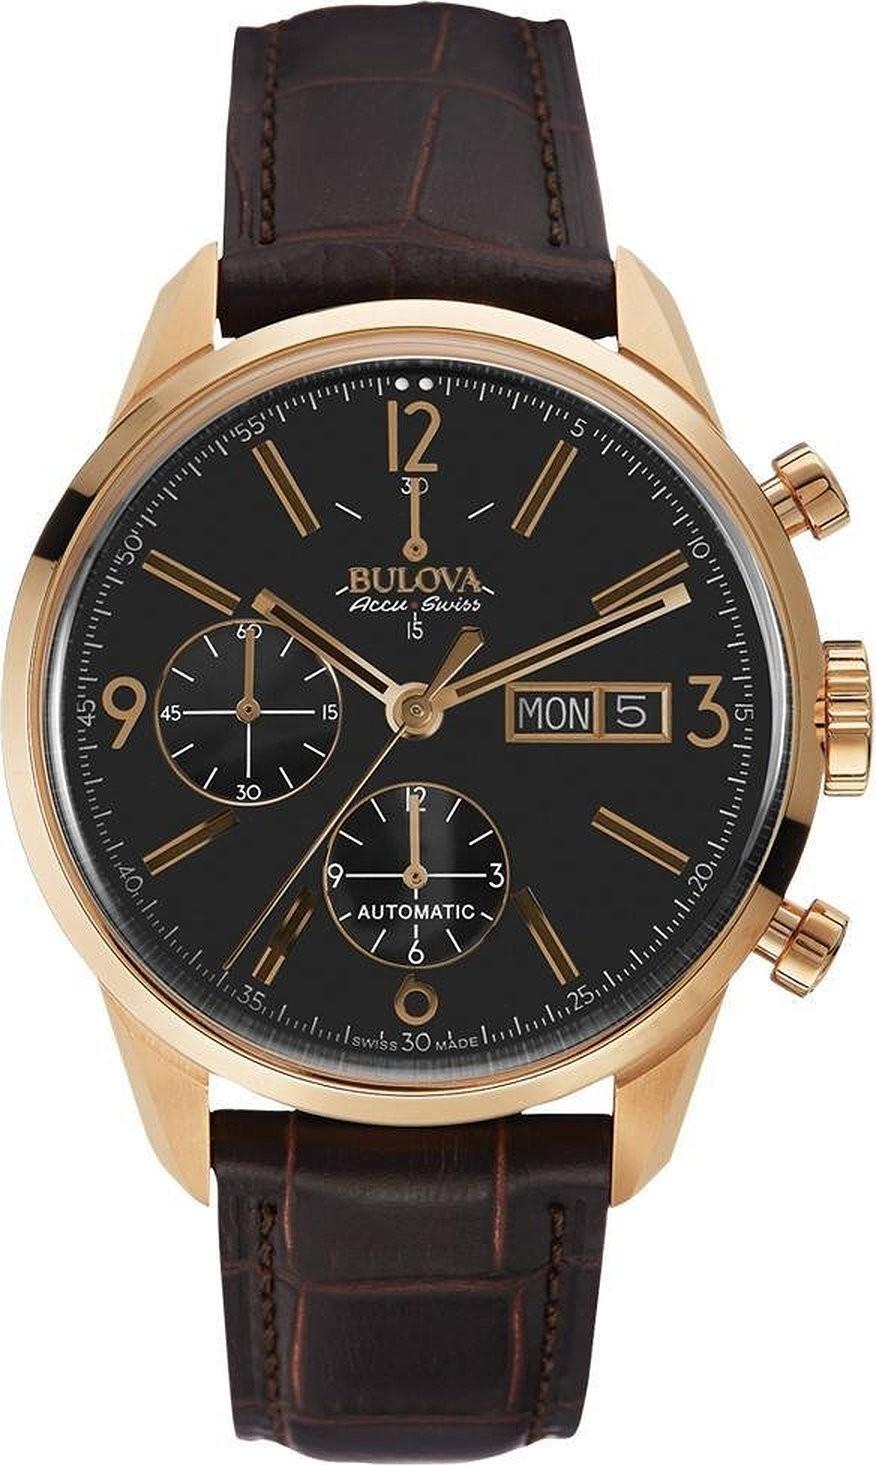 đồng hồ bulova nam